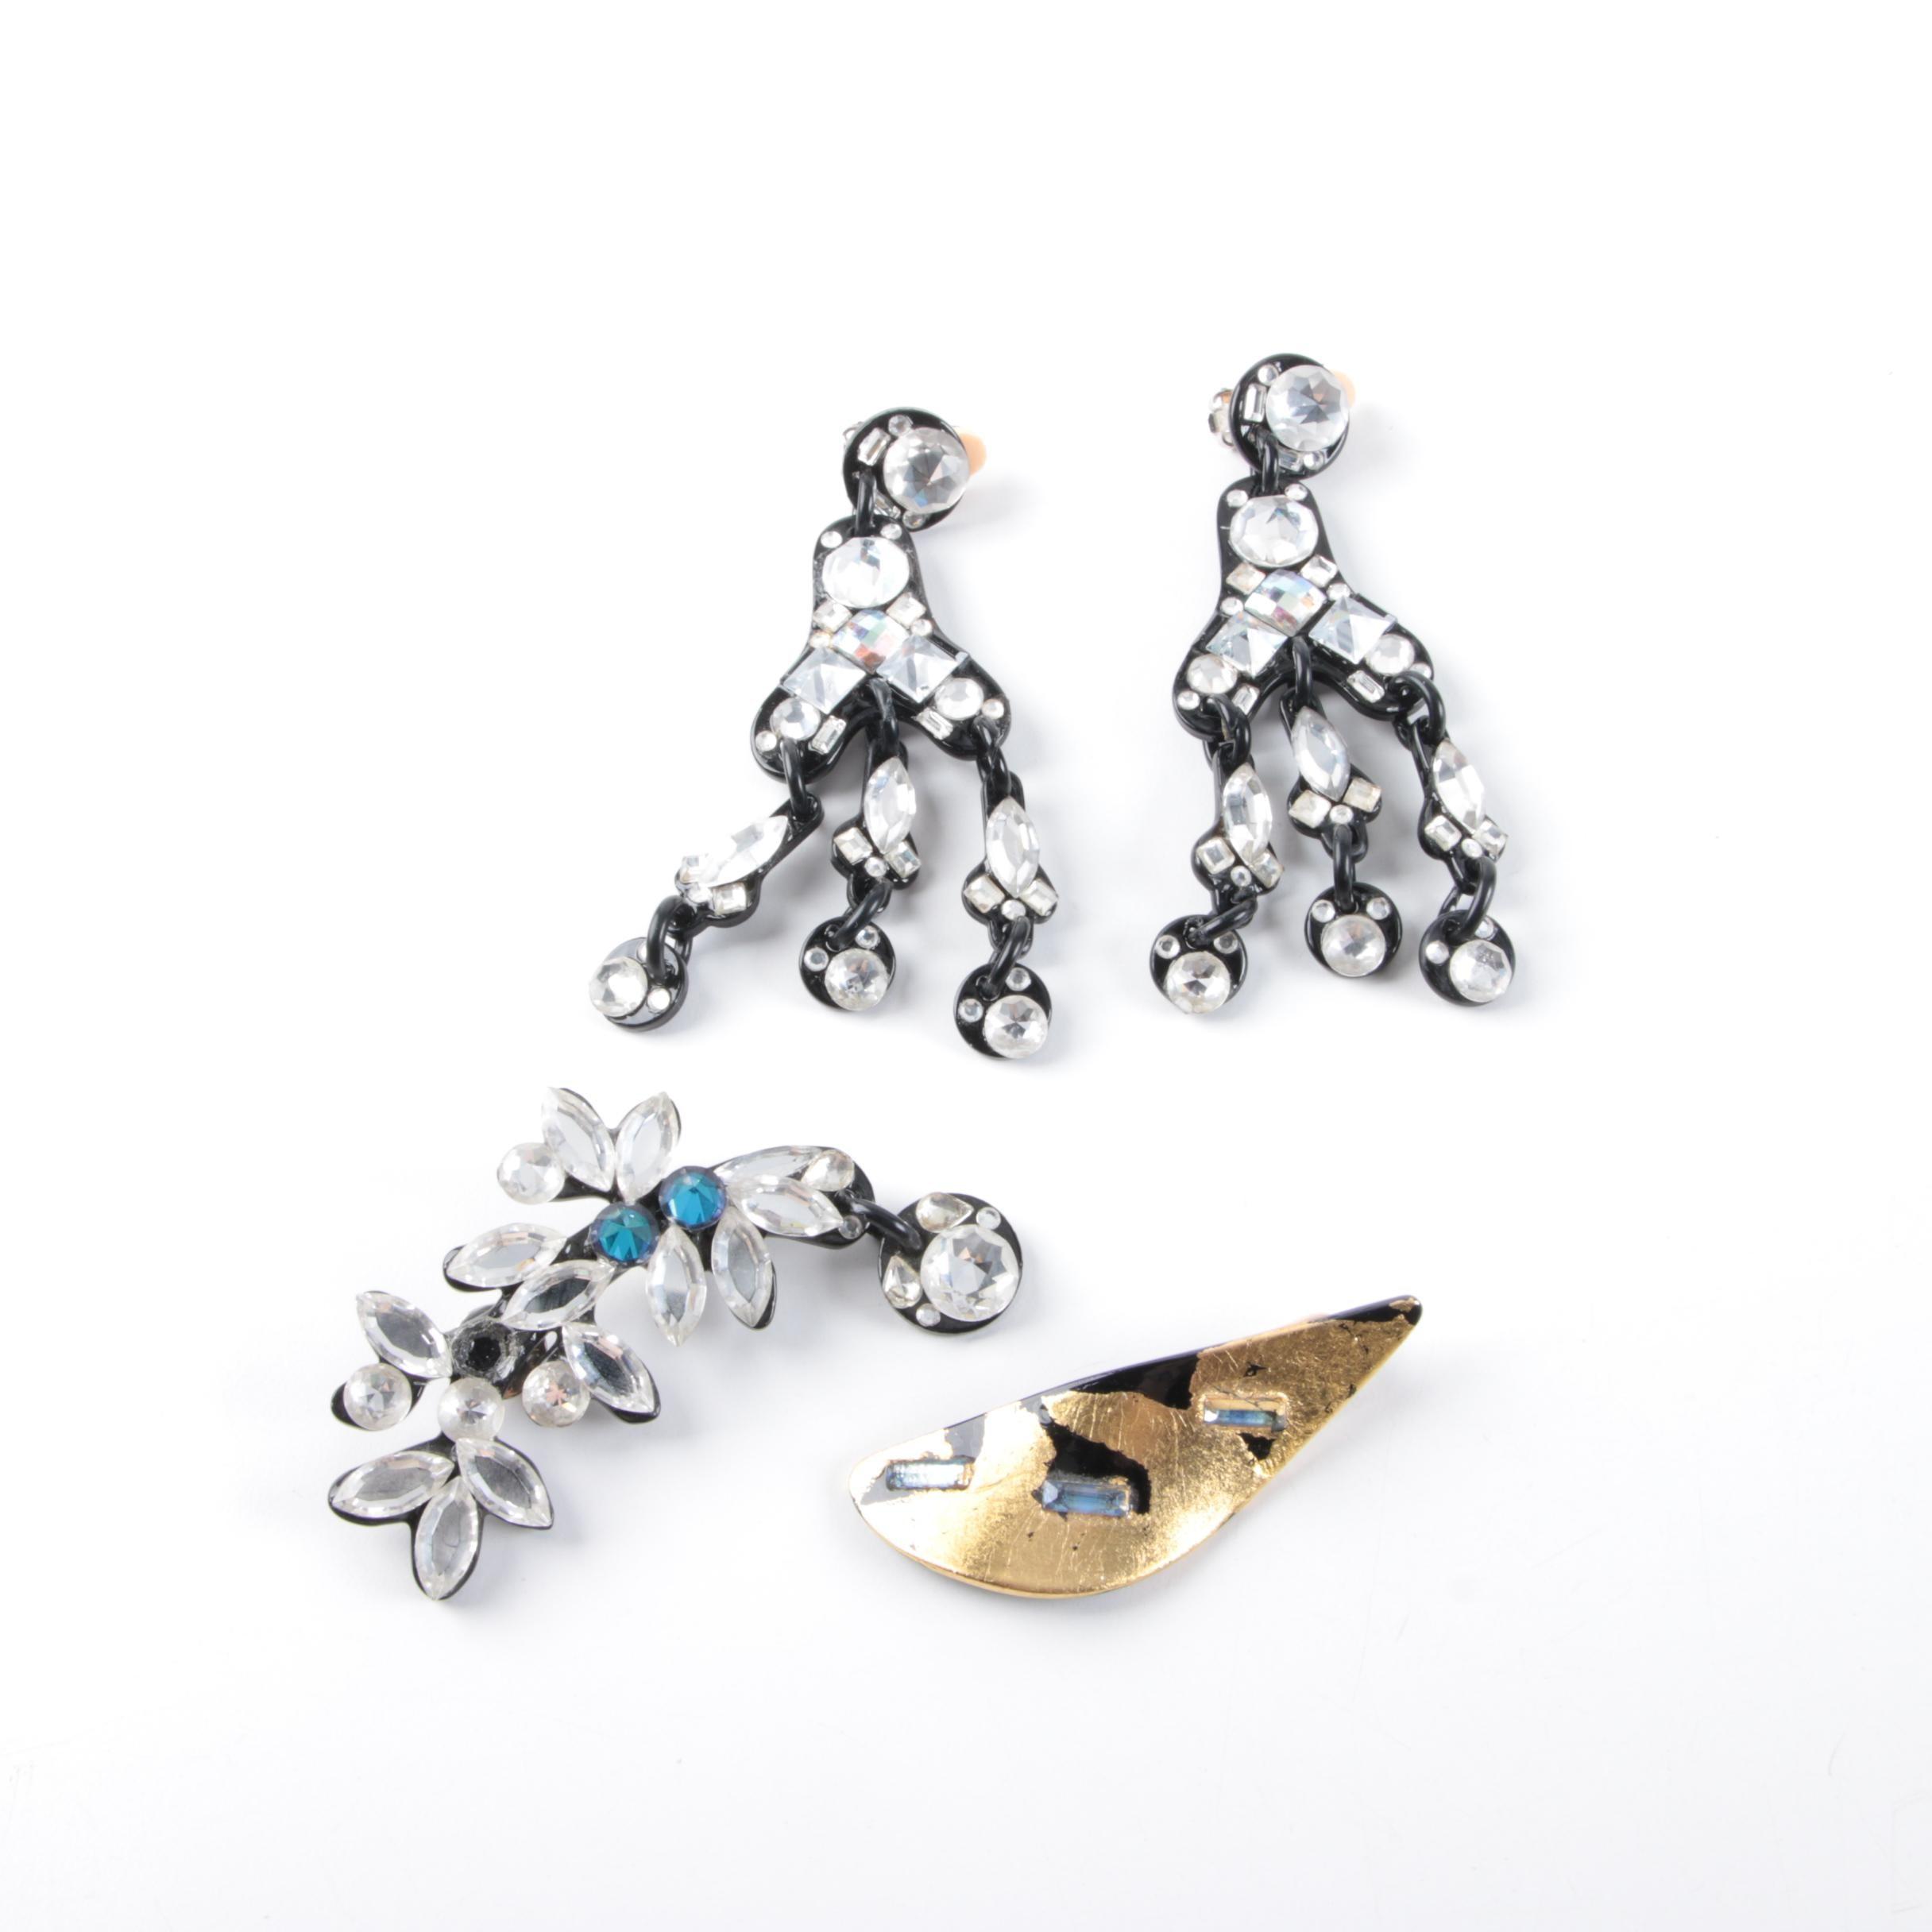 Vintage Bill Schiffer Jewelry With Swarovski Crystals